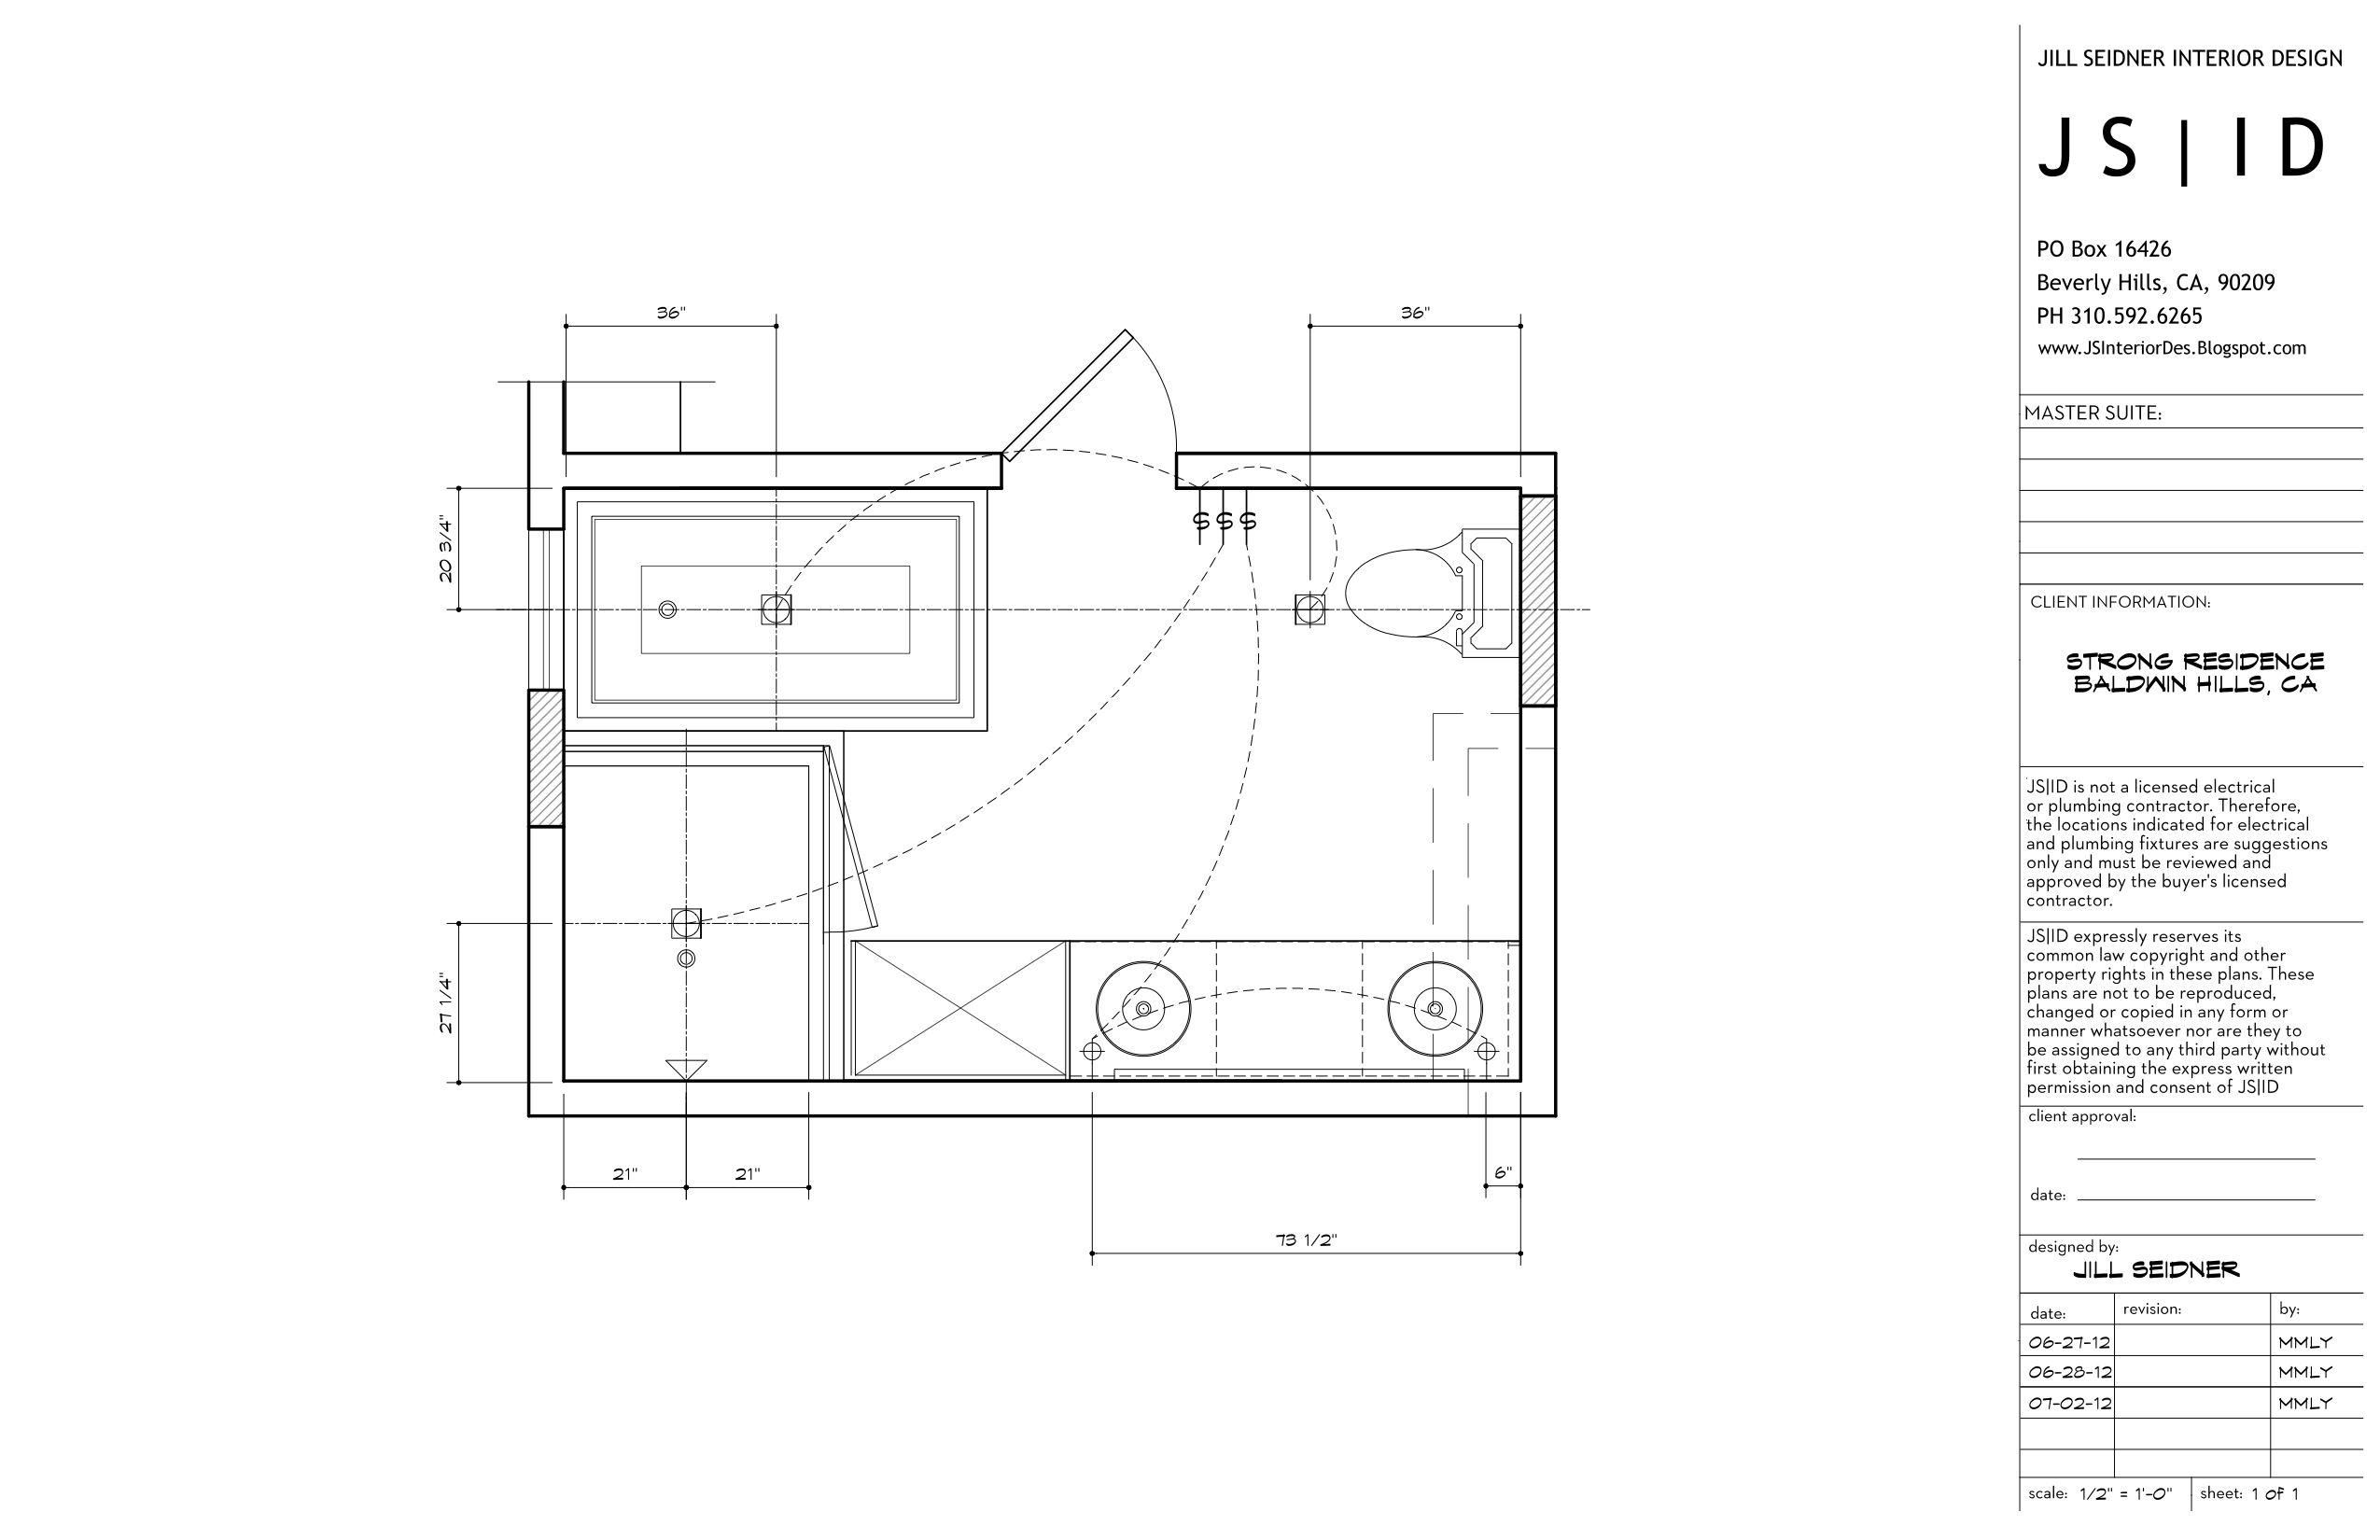 Contractors For Remodeling Home Concept Plans baldwin hills, ca residence, master bathroom remodel lighting